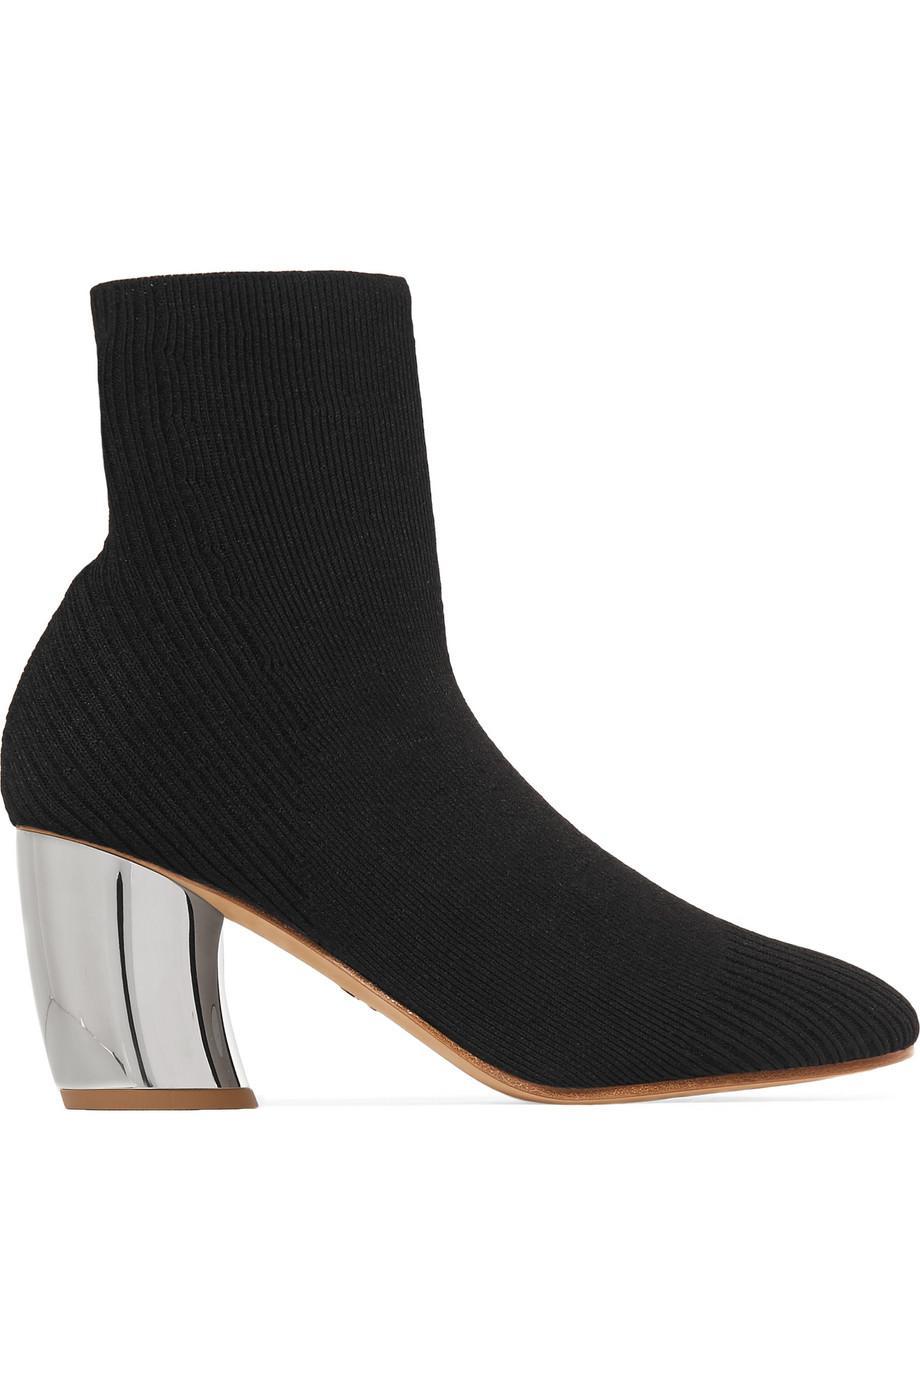 Proenza Schouler Ribbed Sock Booties jYuYXcXucI